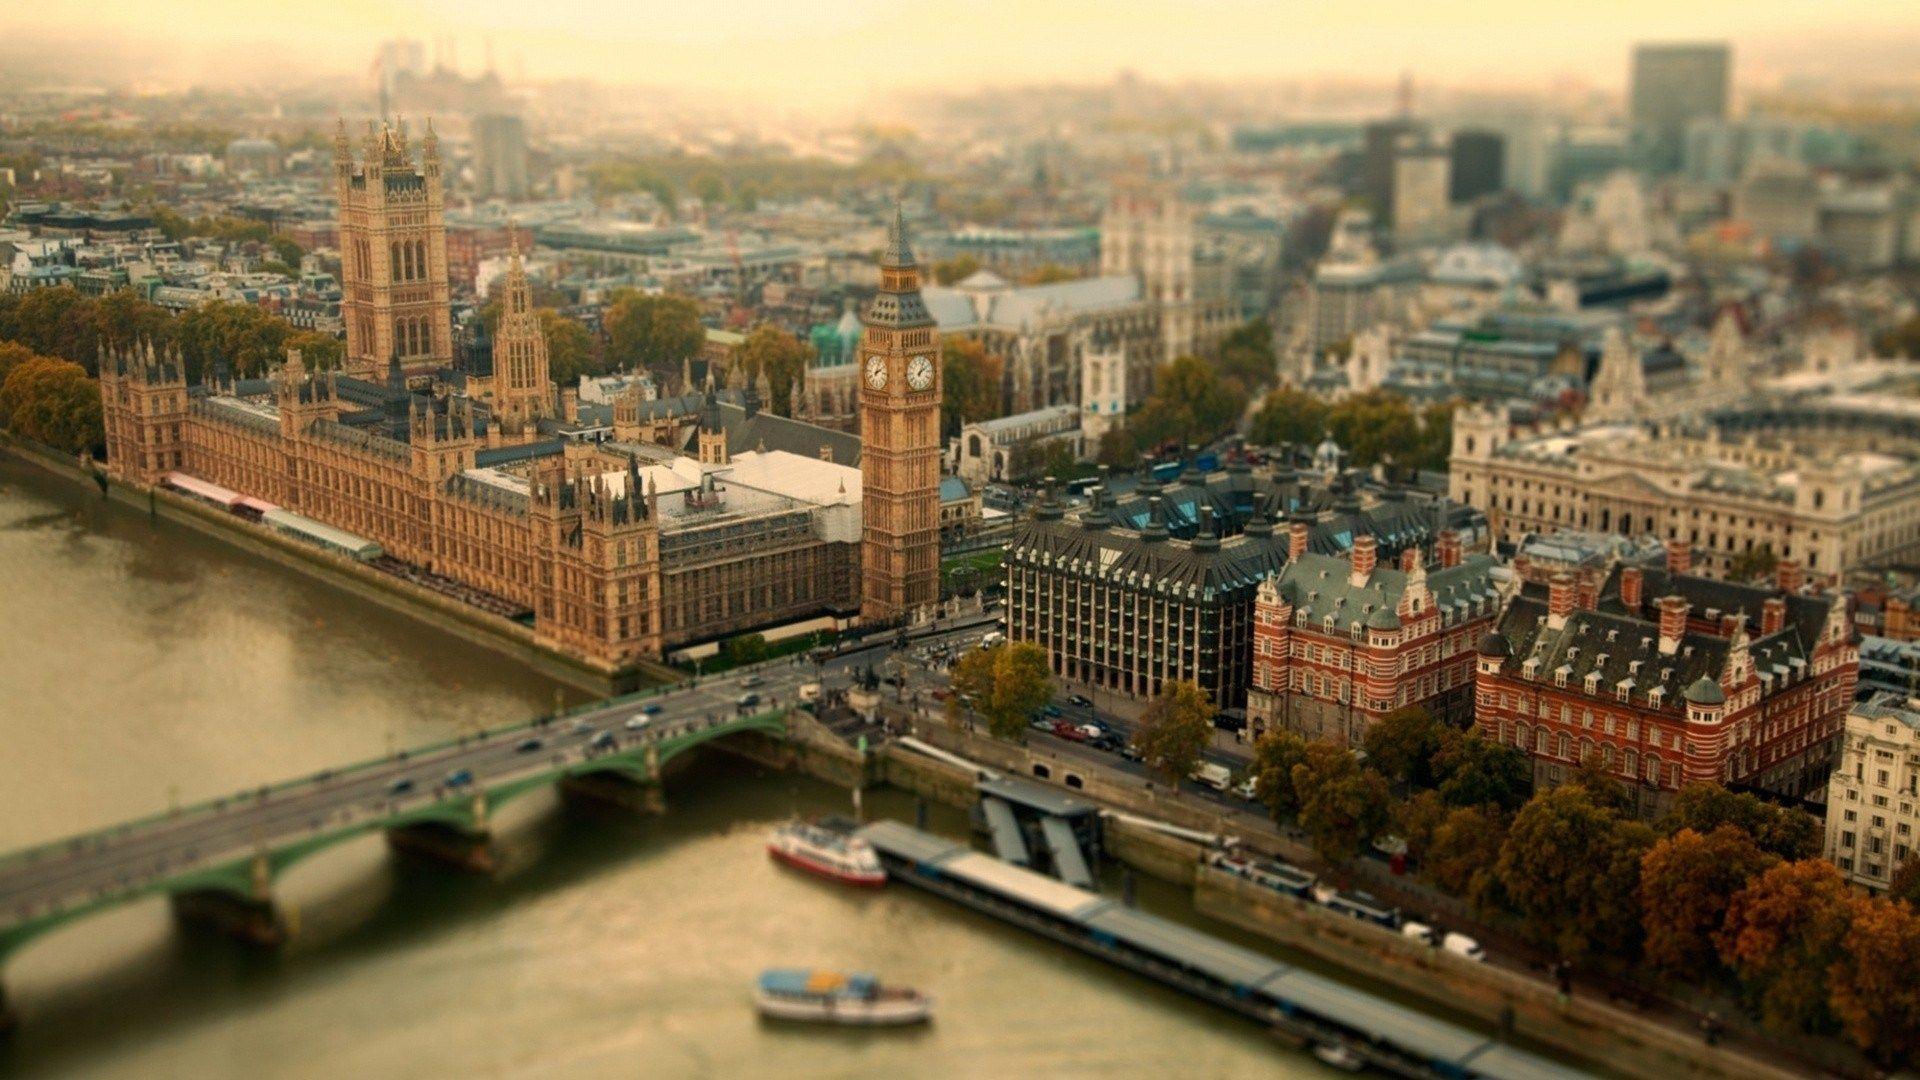 Hd wallpaper london - United Kingdom Hd Wallpapers Find Best Latest United Kingdom Hd Wallpapers For Your Pc Desktop